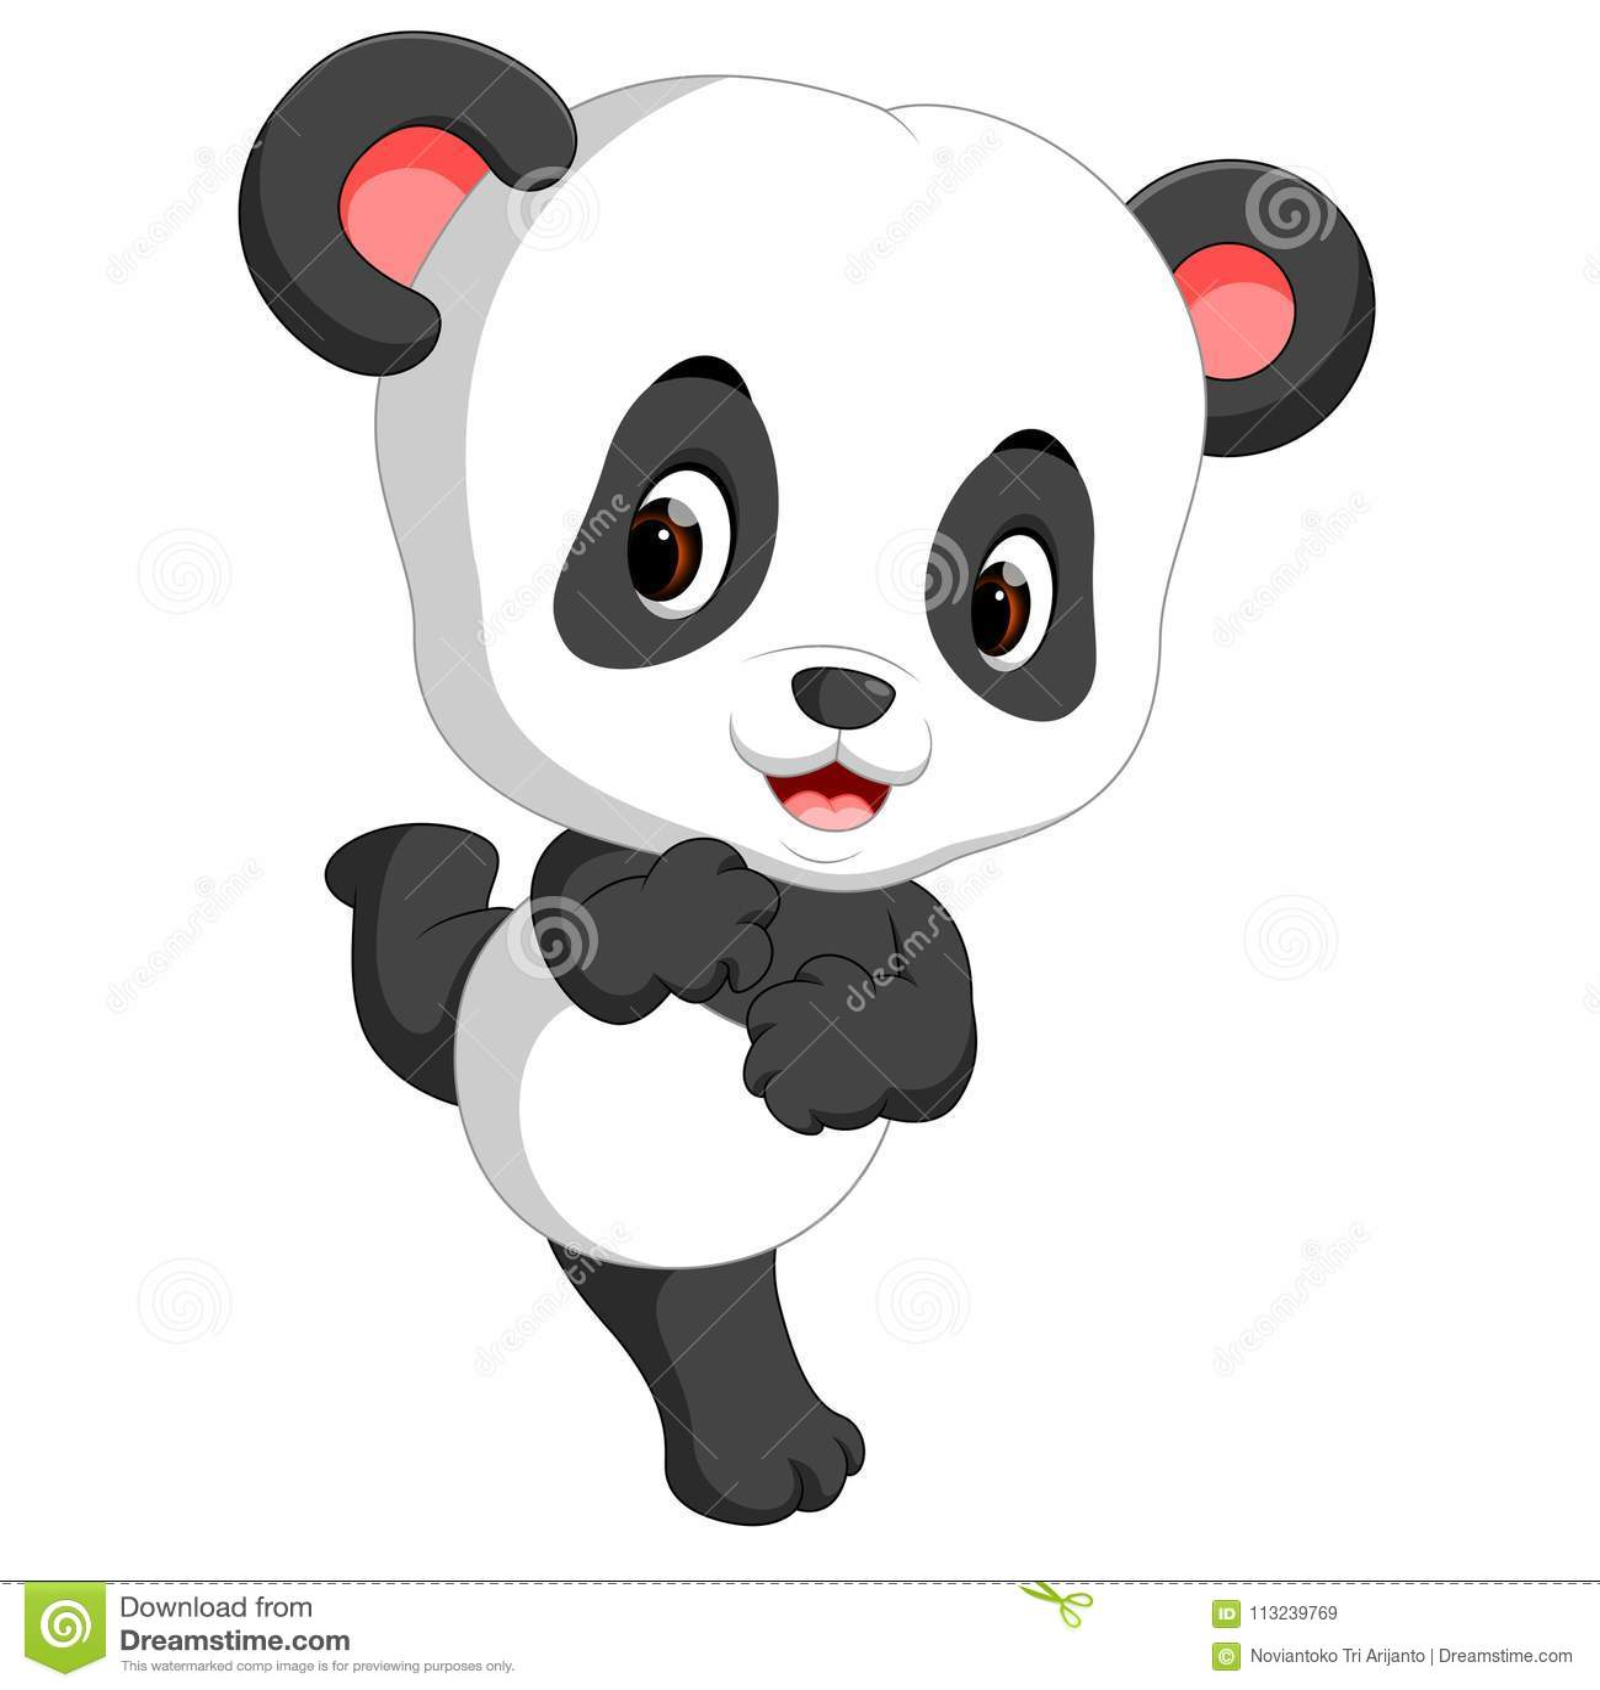 Cute Baby Panda Cartoon Stock Vector Illustration Of Comic 113239769